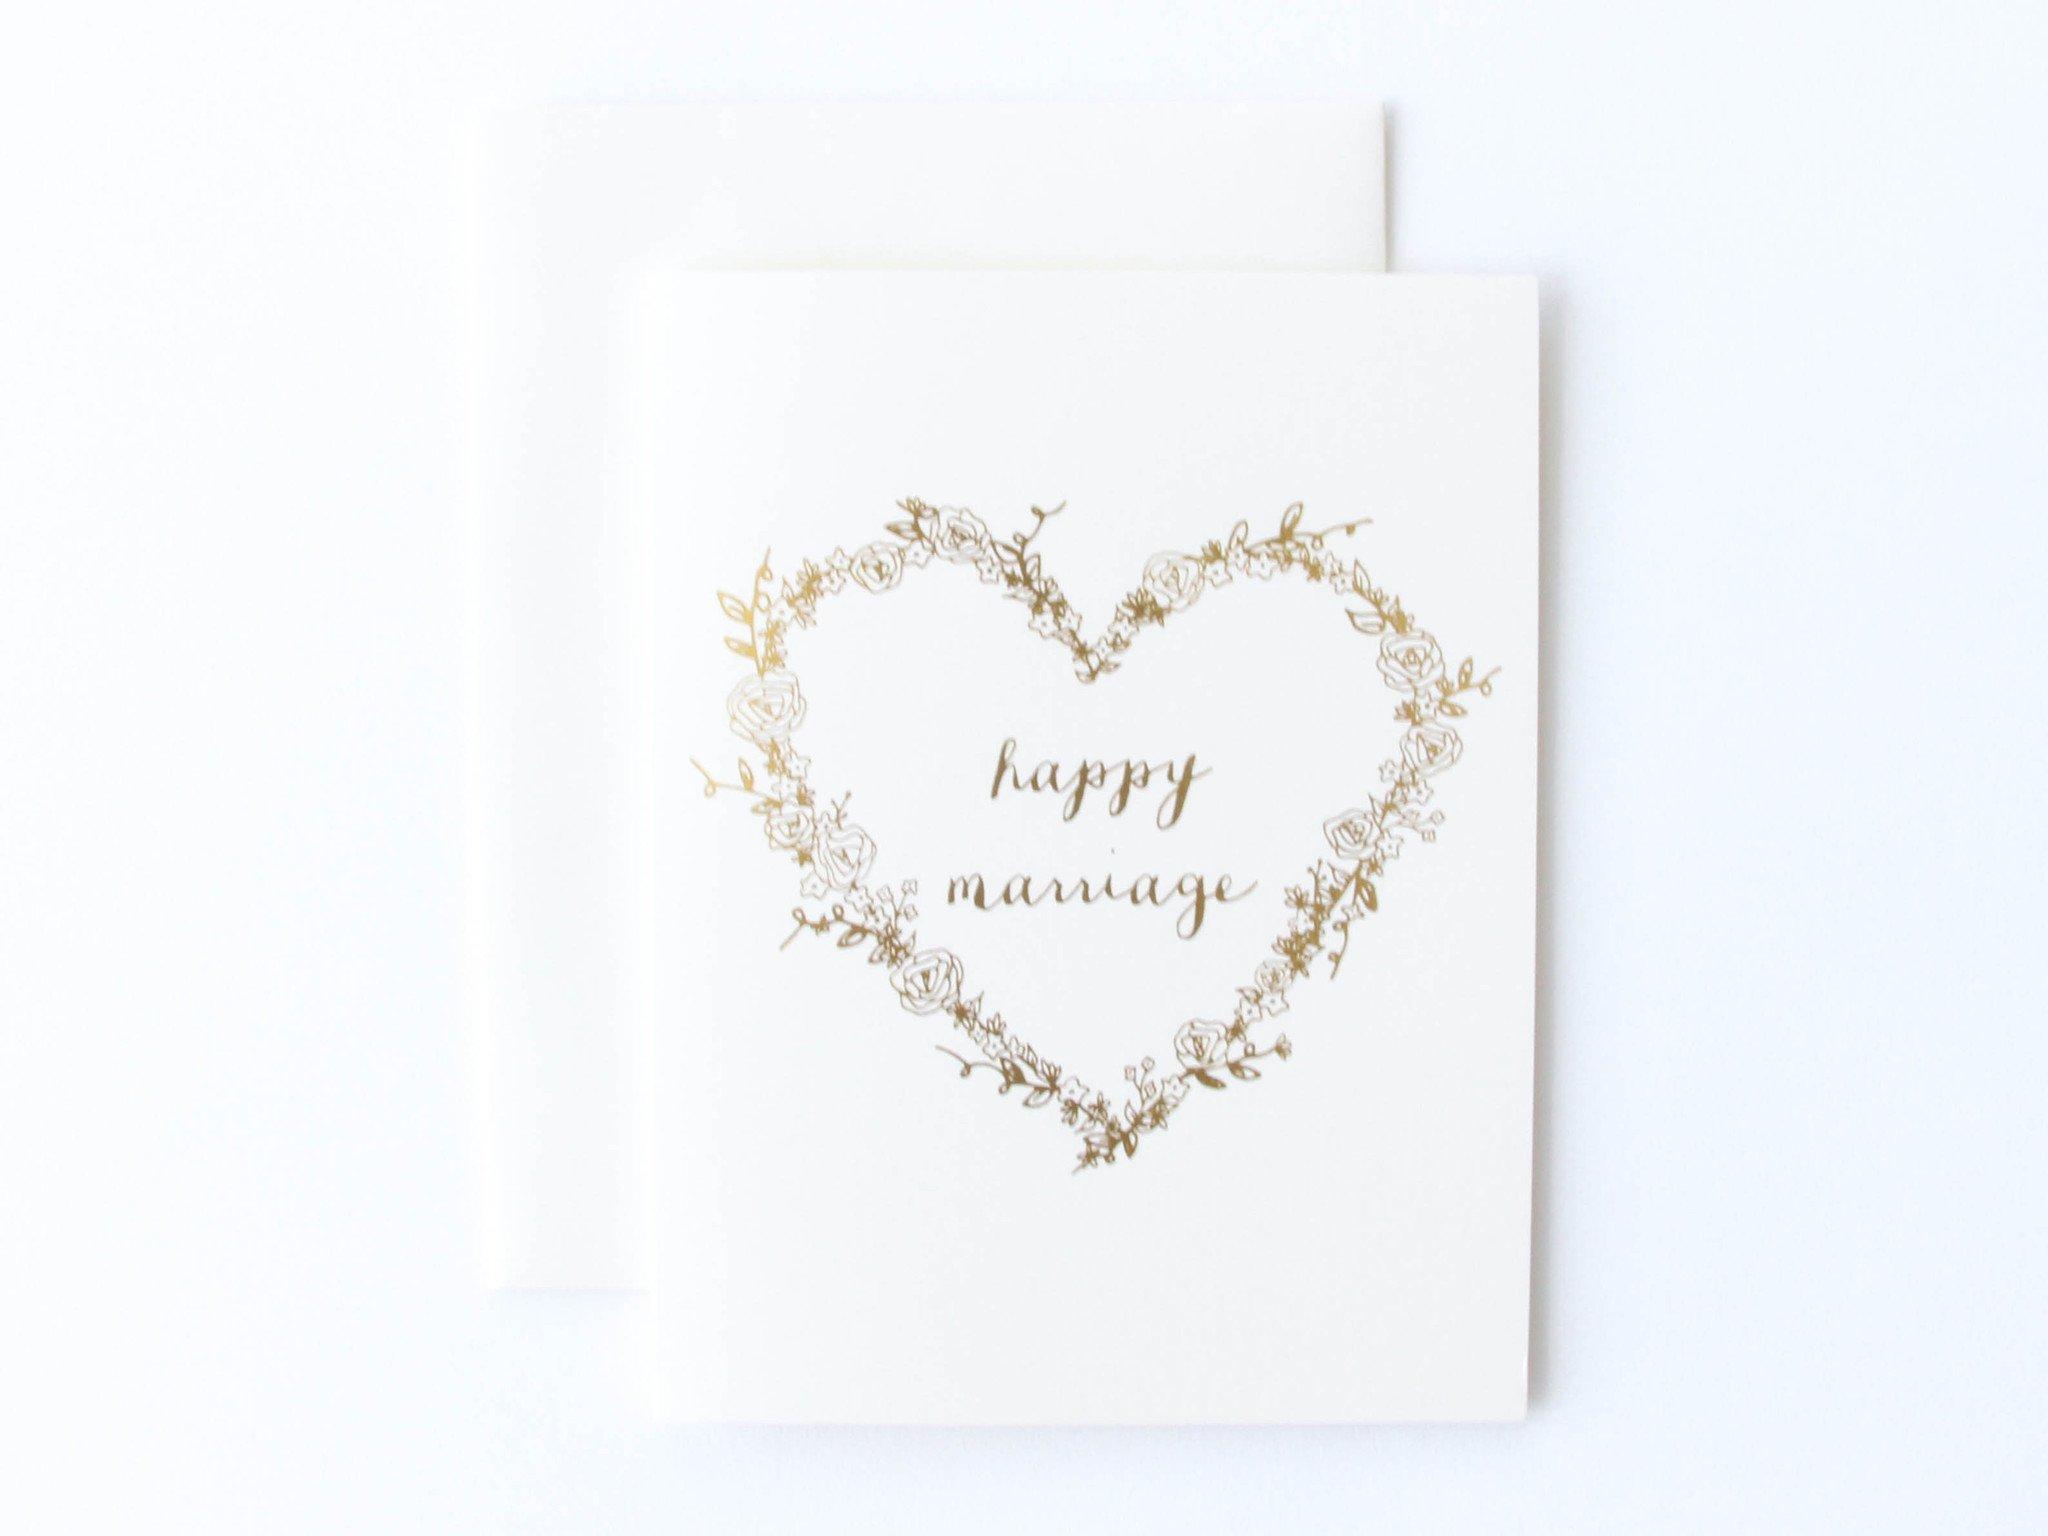 Happy Marriage Card by Paula & Waffle